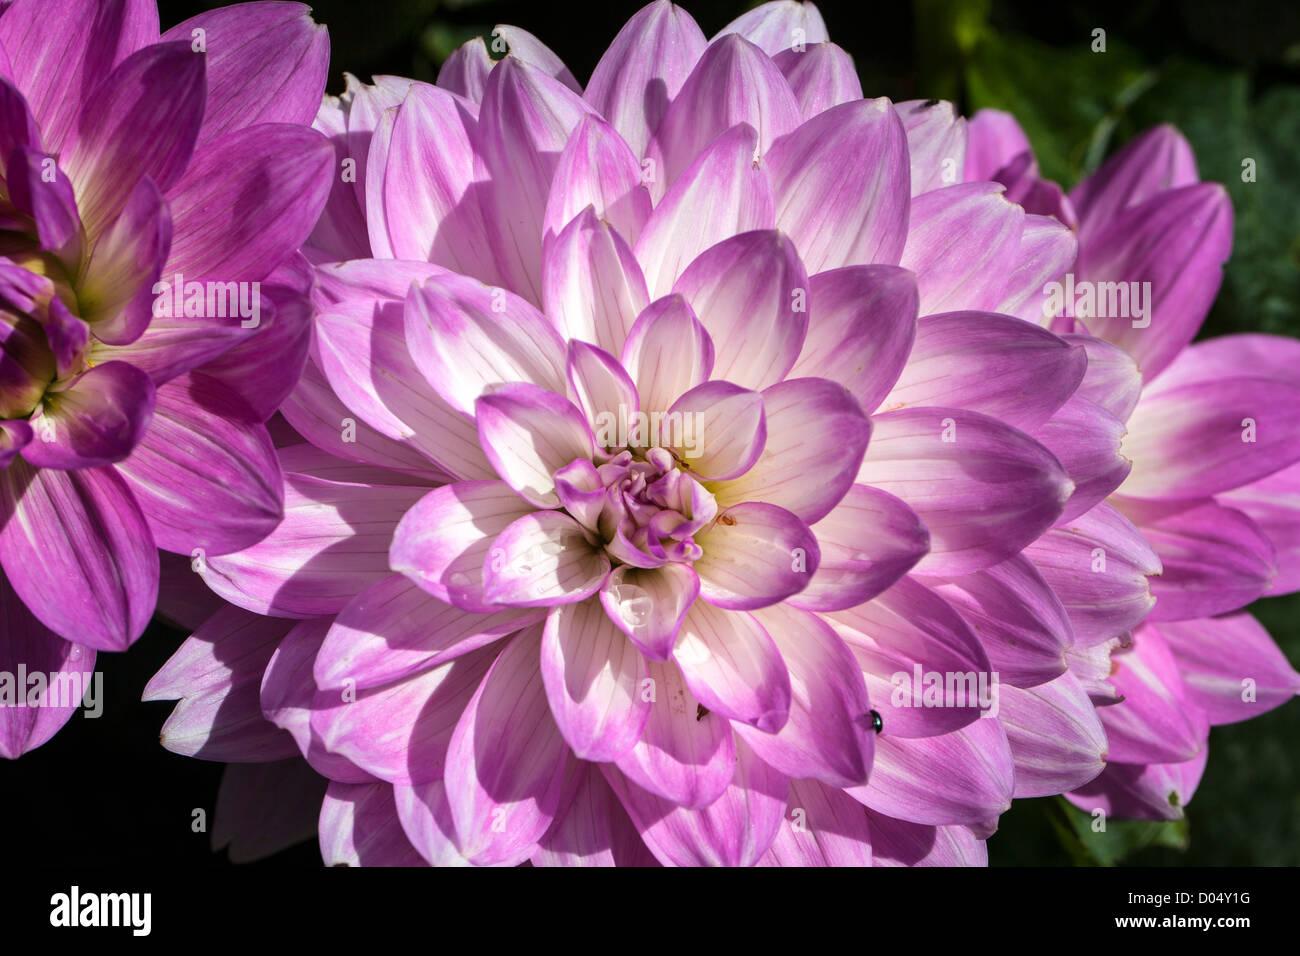 'Twilight time' Waterlily dahlia, Näckrosblommiga gruppen (Dahlia x Hortensis) - Stock Image